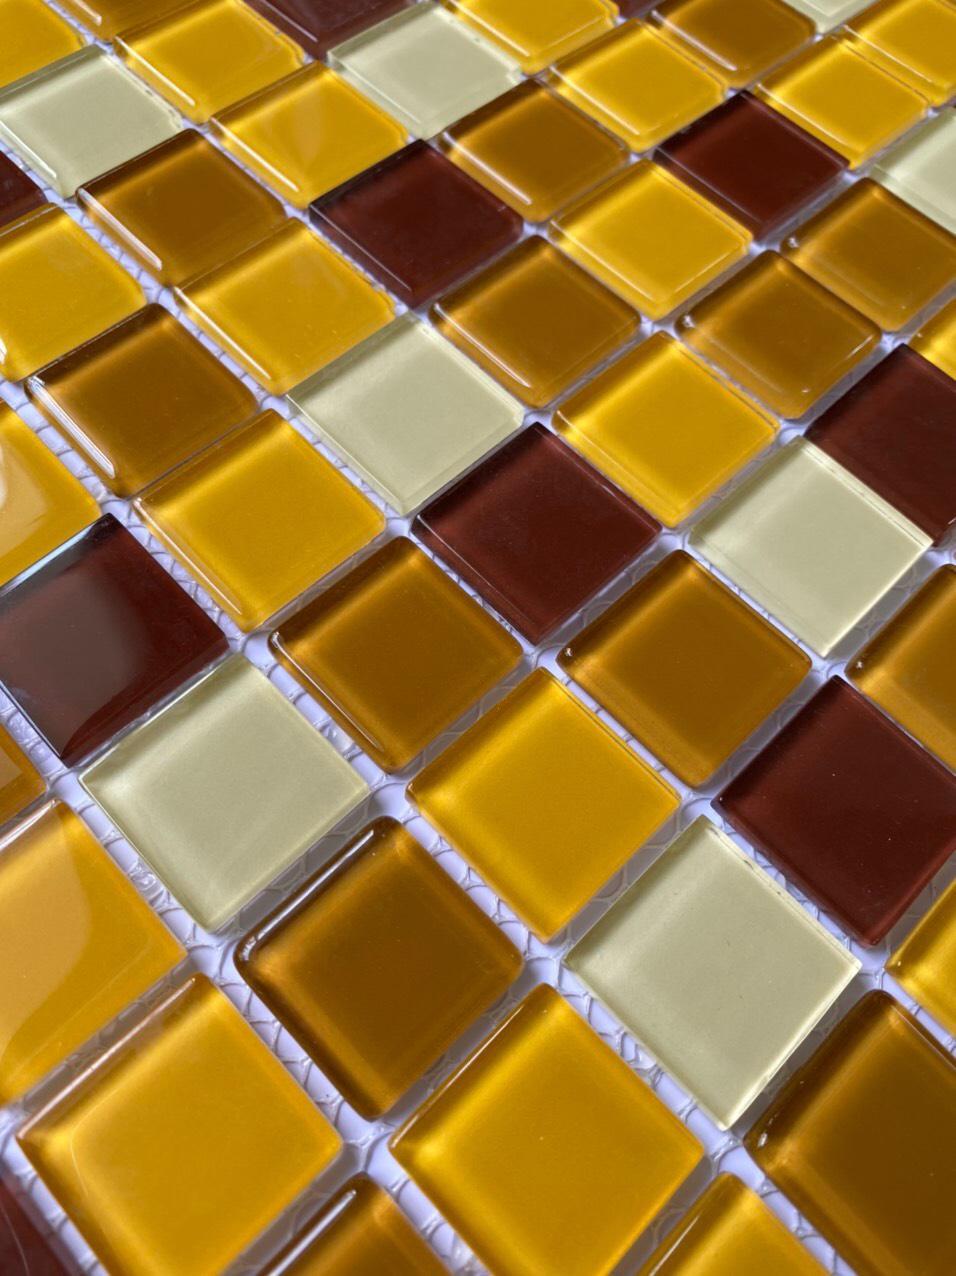 gach mosaic 30x30 vang nau